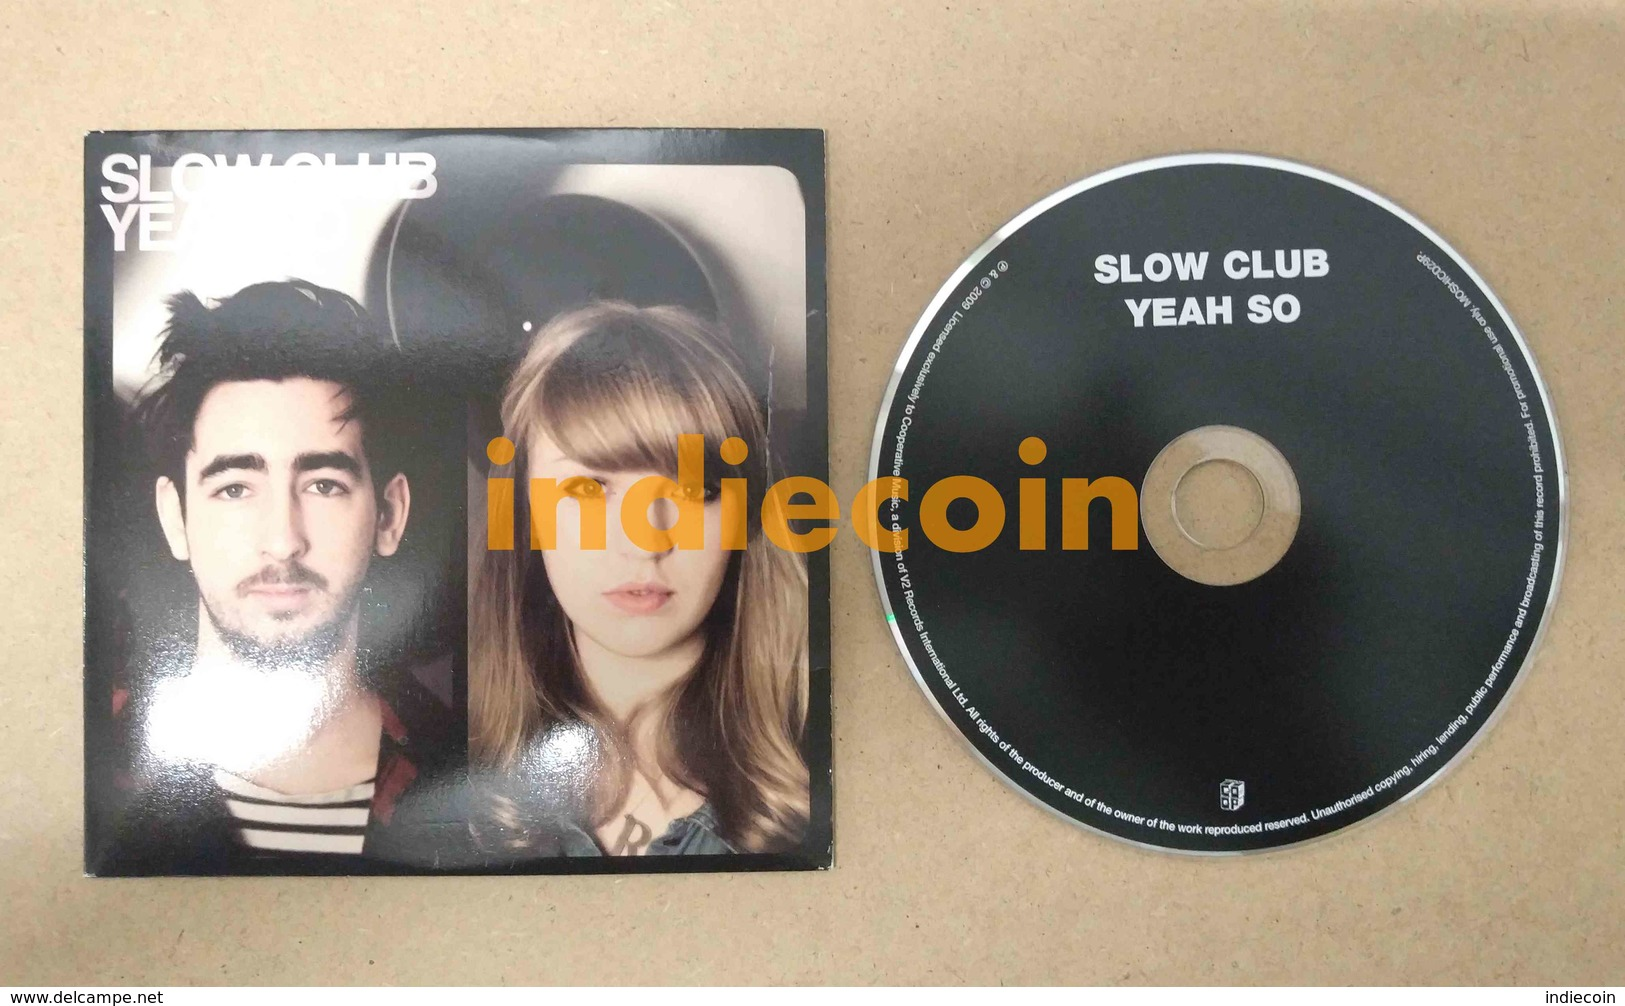 SLOW CLUB Yeah So 2009 UK CD LP Promo Cardsleeve - Music & Instruments